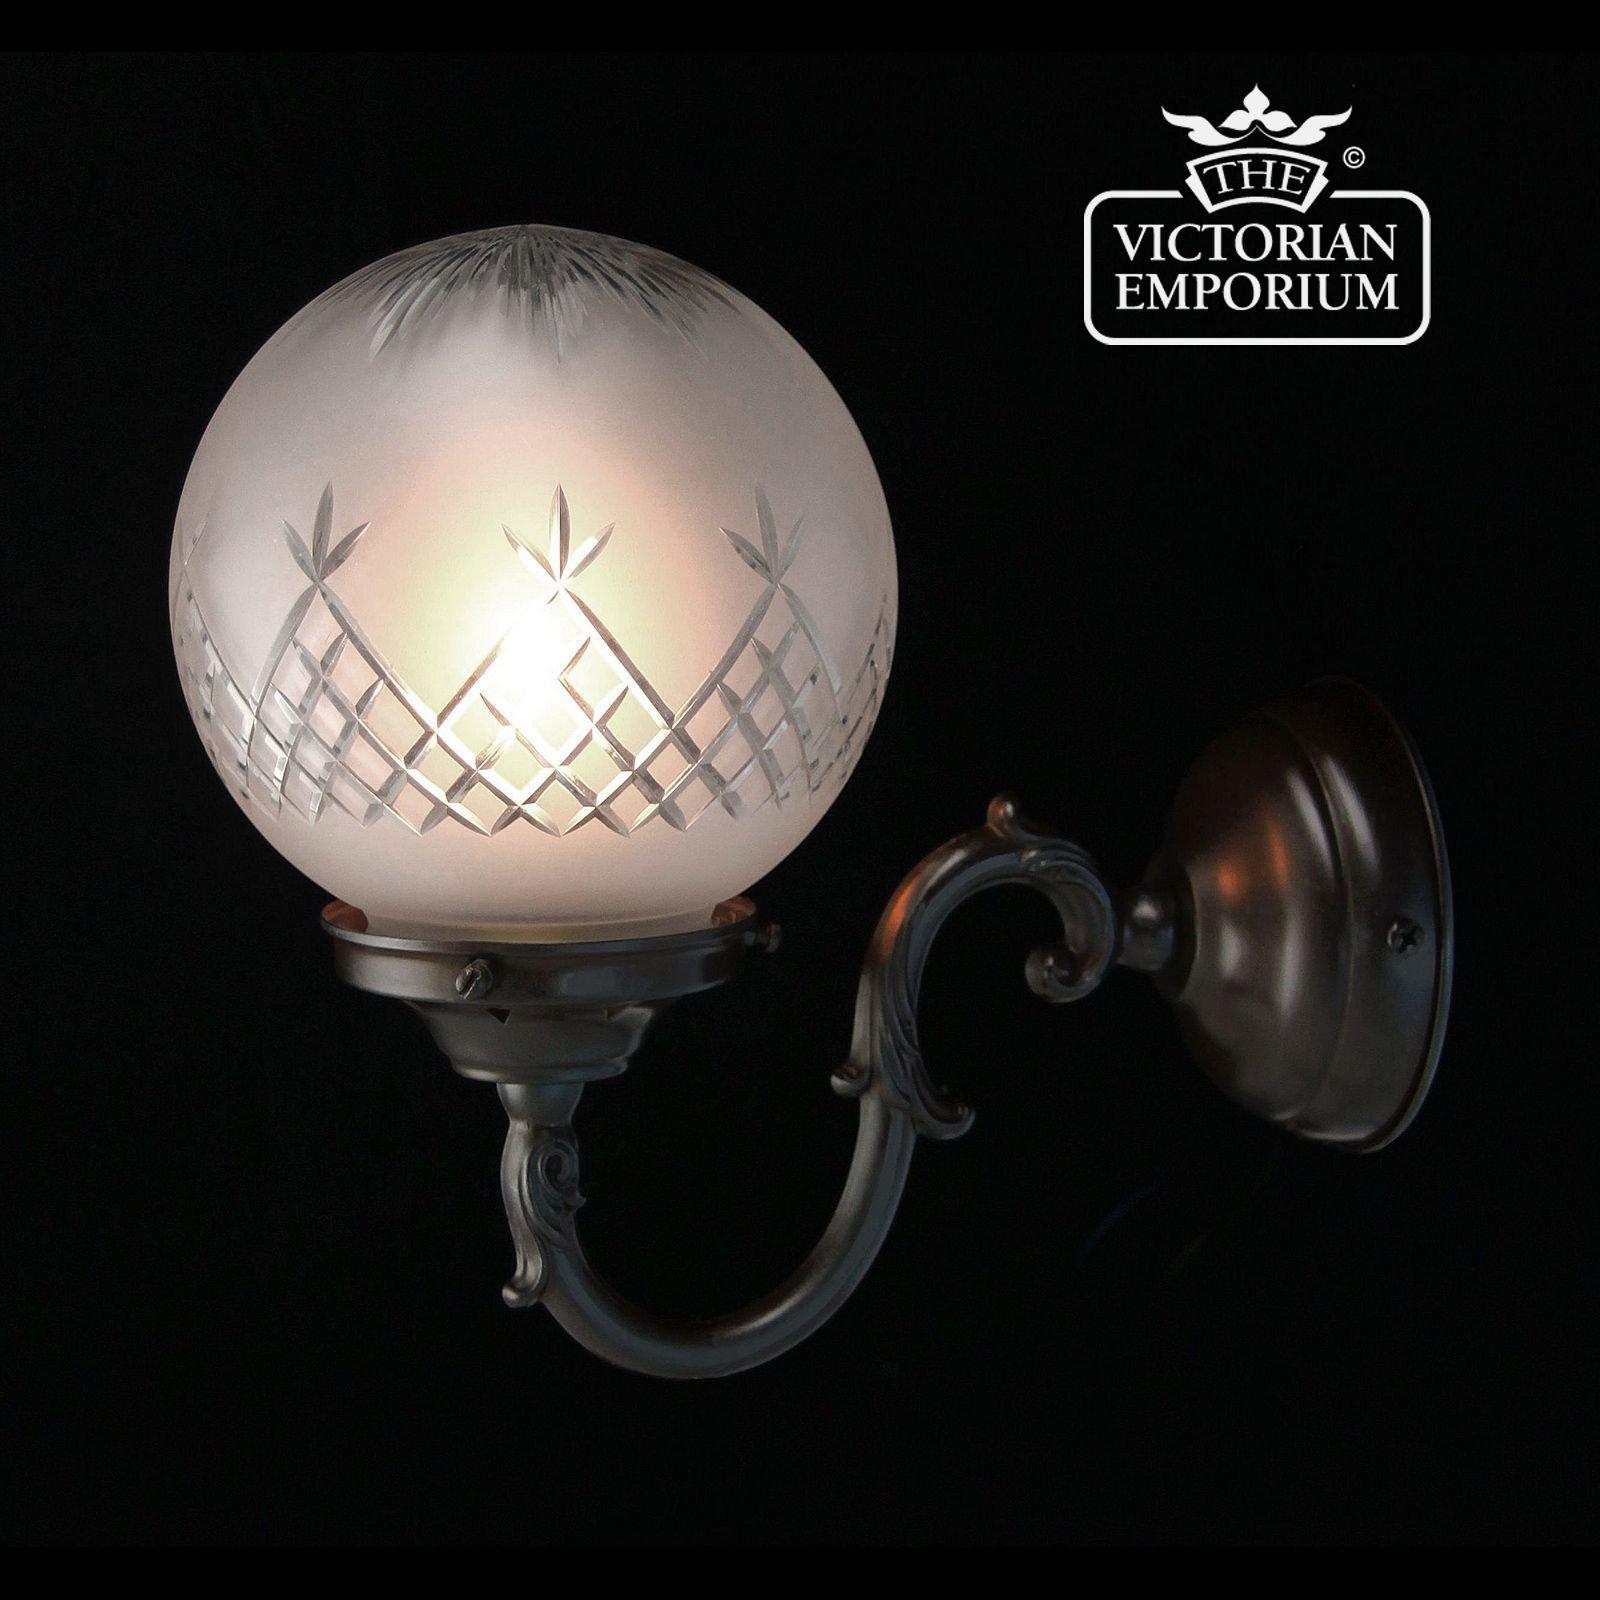 Bronze Glass Wall Lights : Pineapple cut glass wall light with antique bronze metalwork